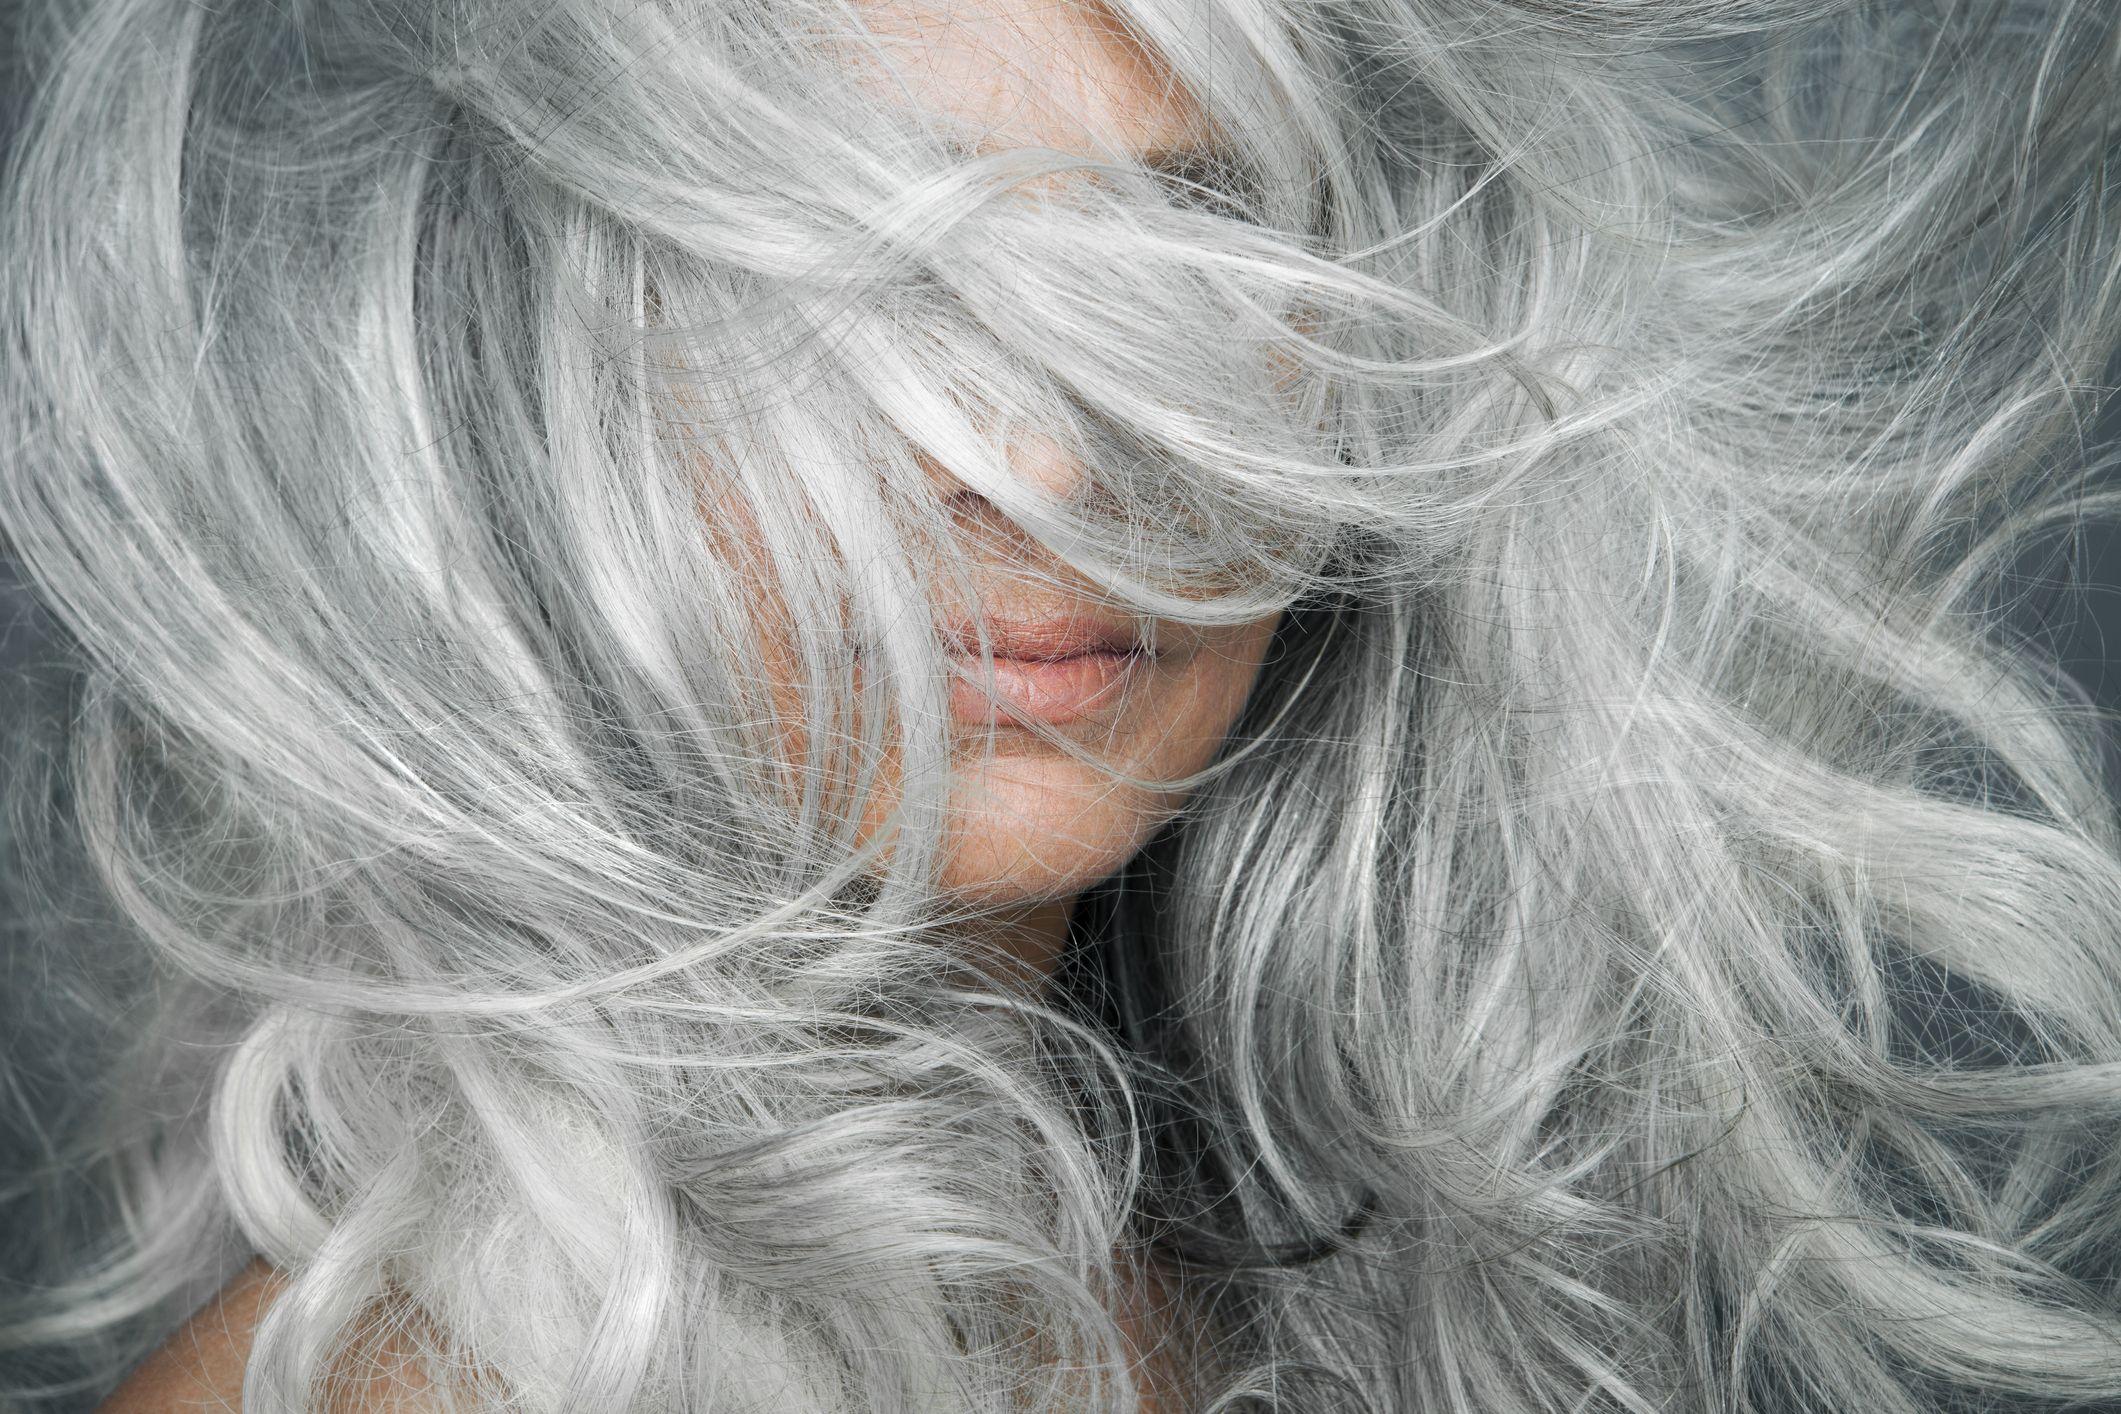 Hair man should his grey a dye Think Twice